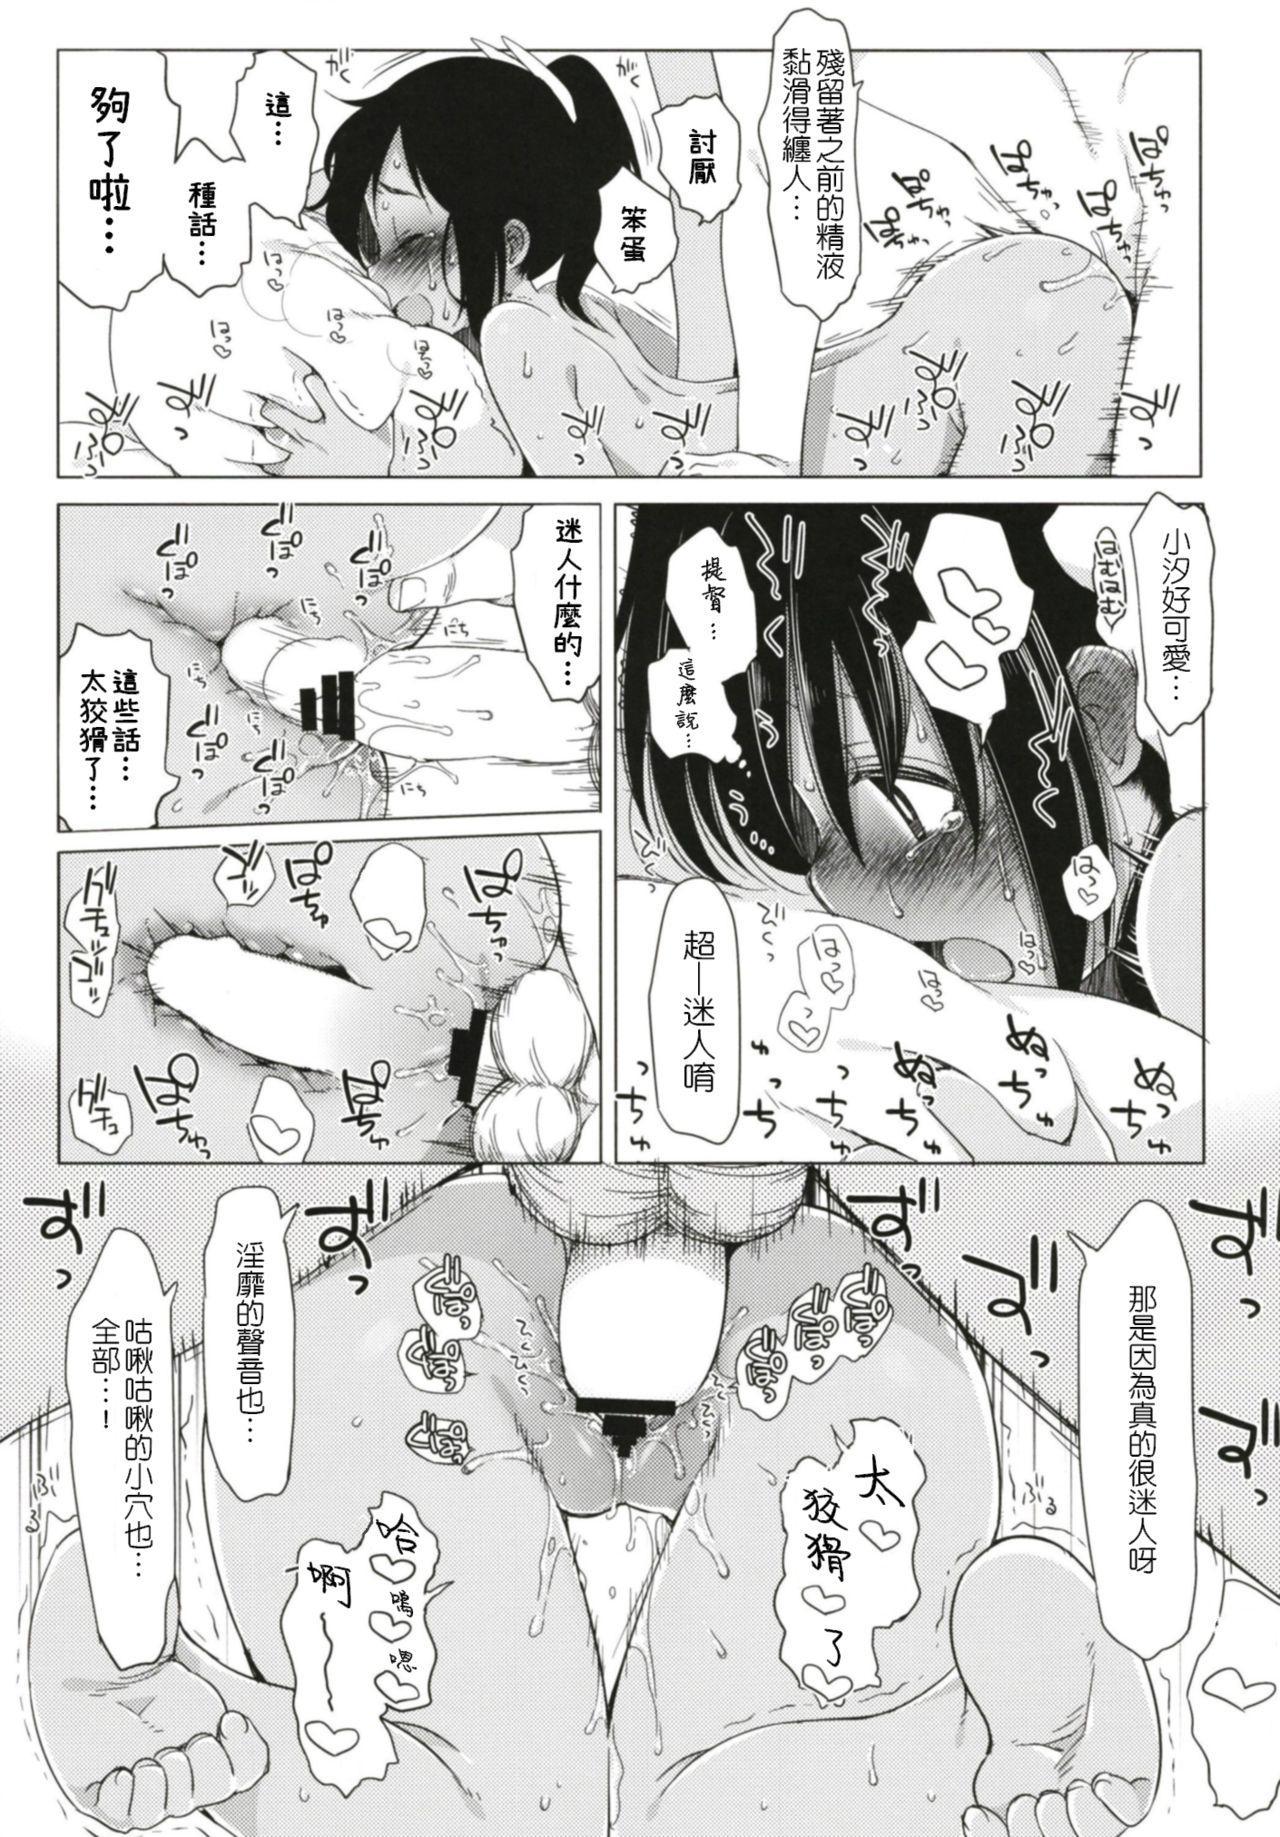 [French letter (Fujisaki Hikari)] Hitonatsu no Ayamachi -I-401 Soushuuhen- (Kantai Collection -KanColle-) [Chinese] [Digital] 24